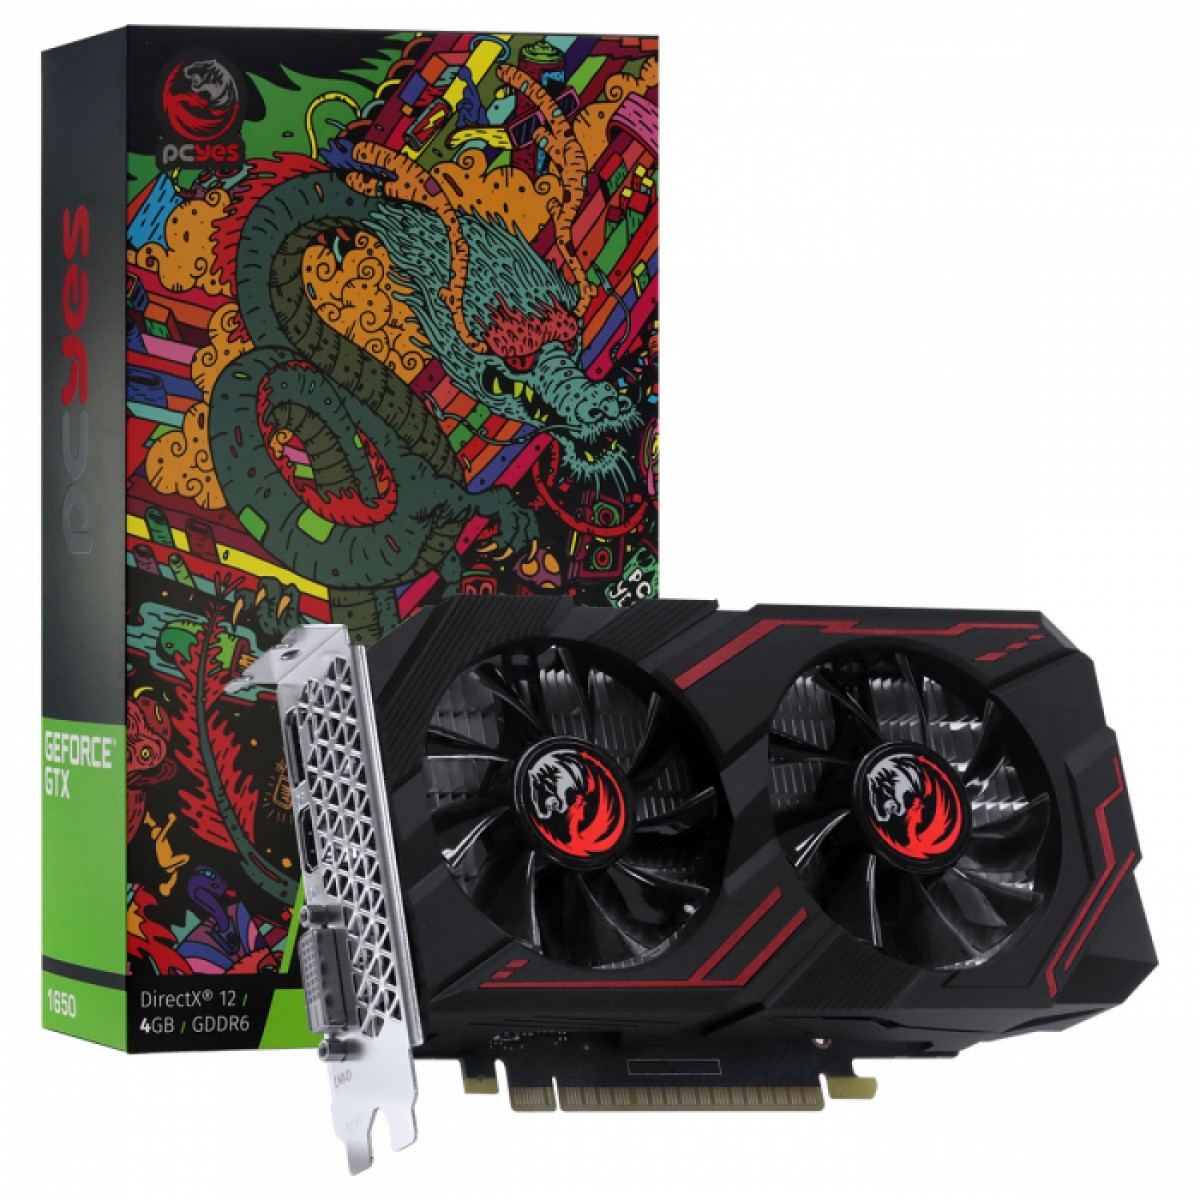 Placa de Vídeo PCYes Geforce GTX 1650 Graffiti Series, 4GB GDDR6, 128bit, PA1650412820DR6